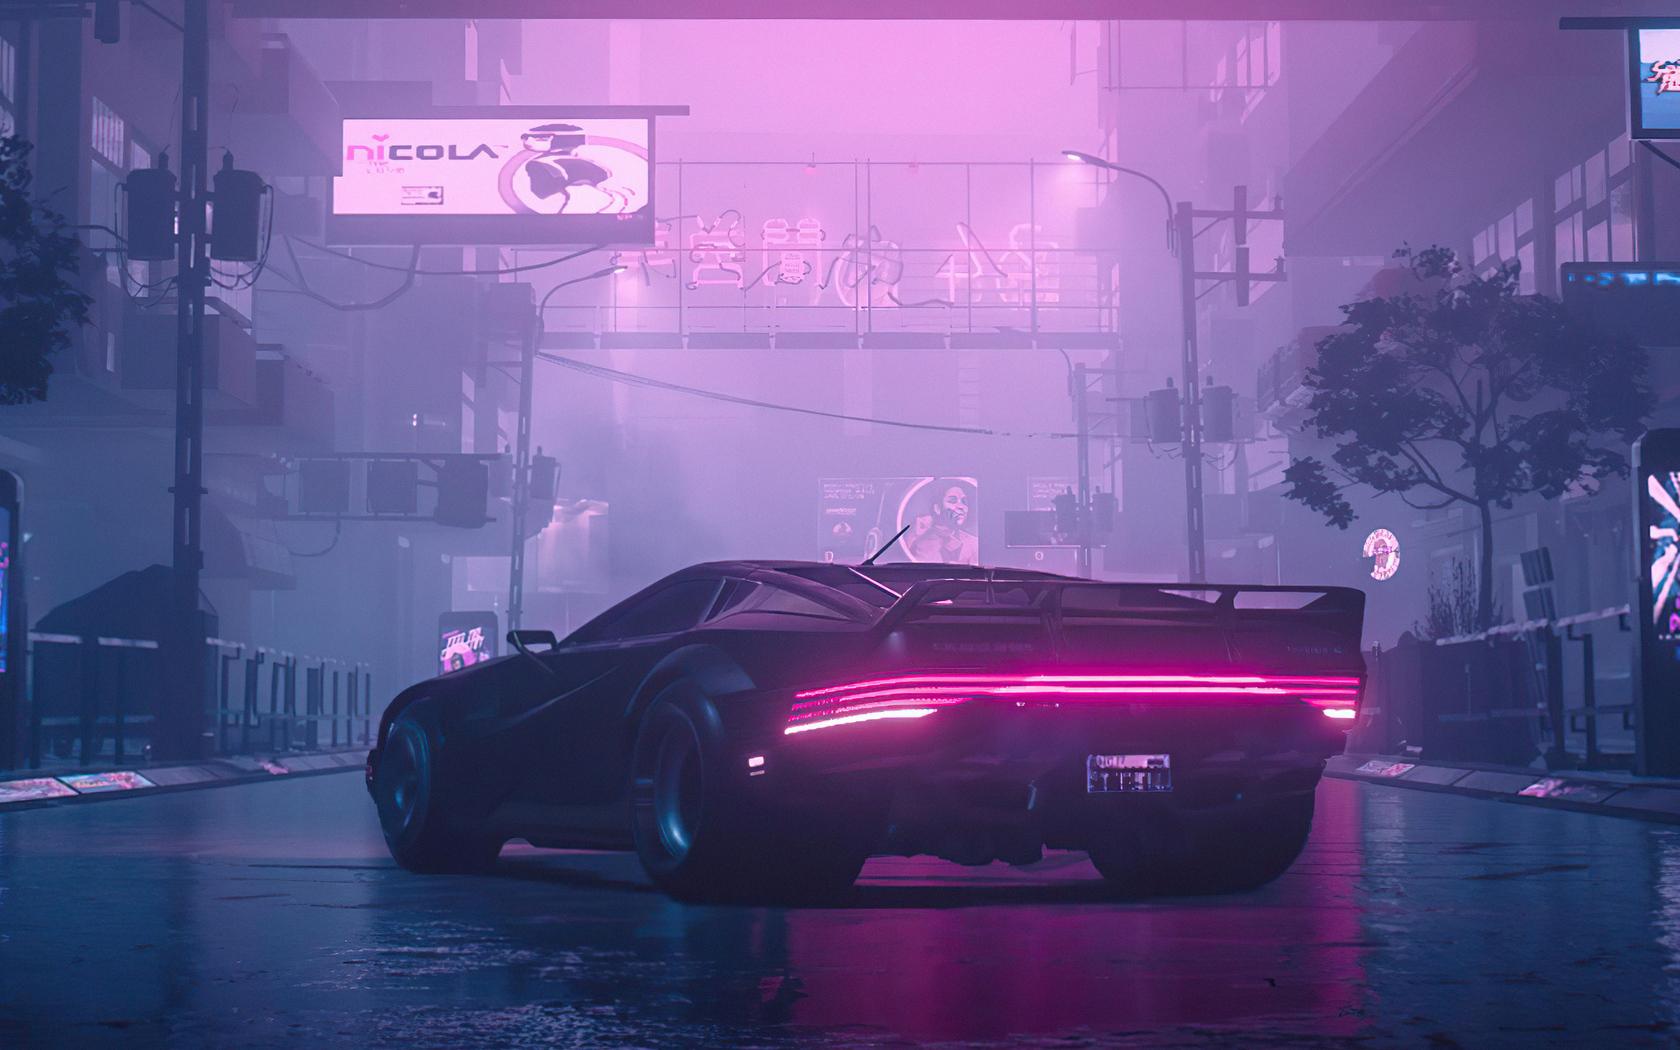 quadra-turbo-neon-cyberpunk-2077-4k-1g.jpg